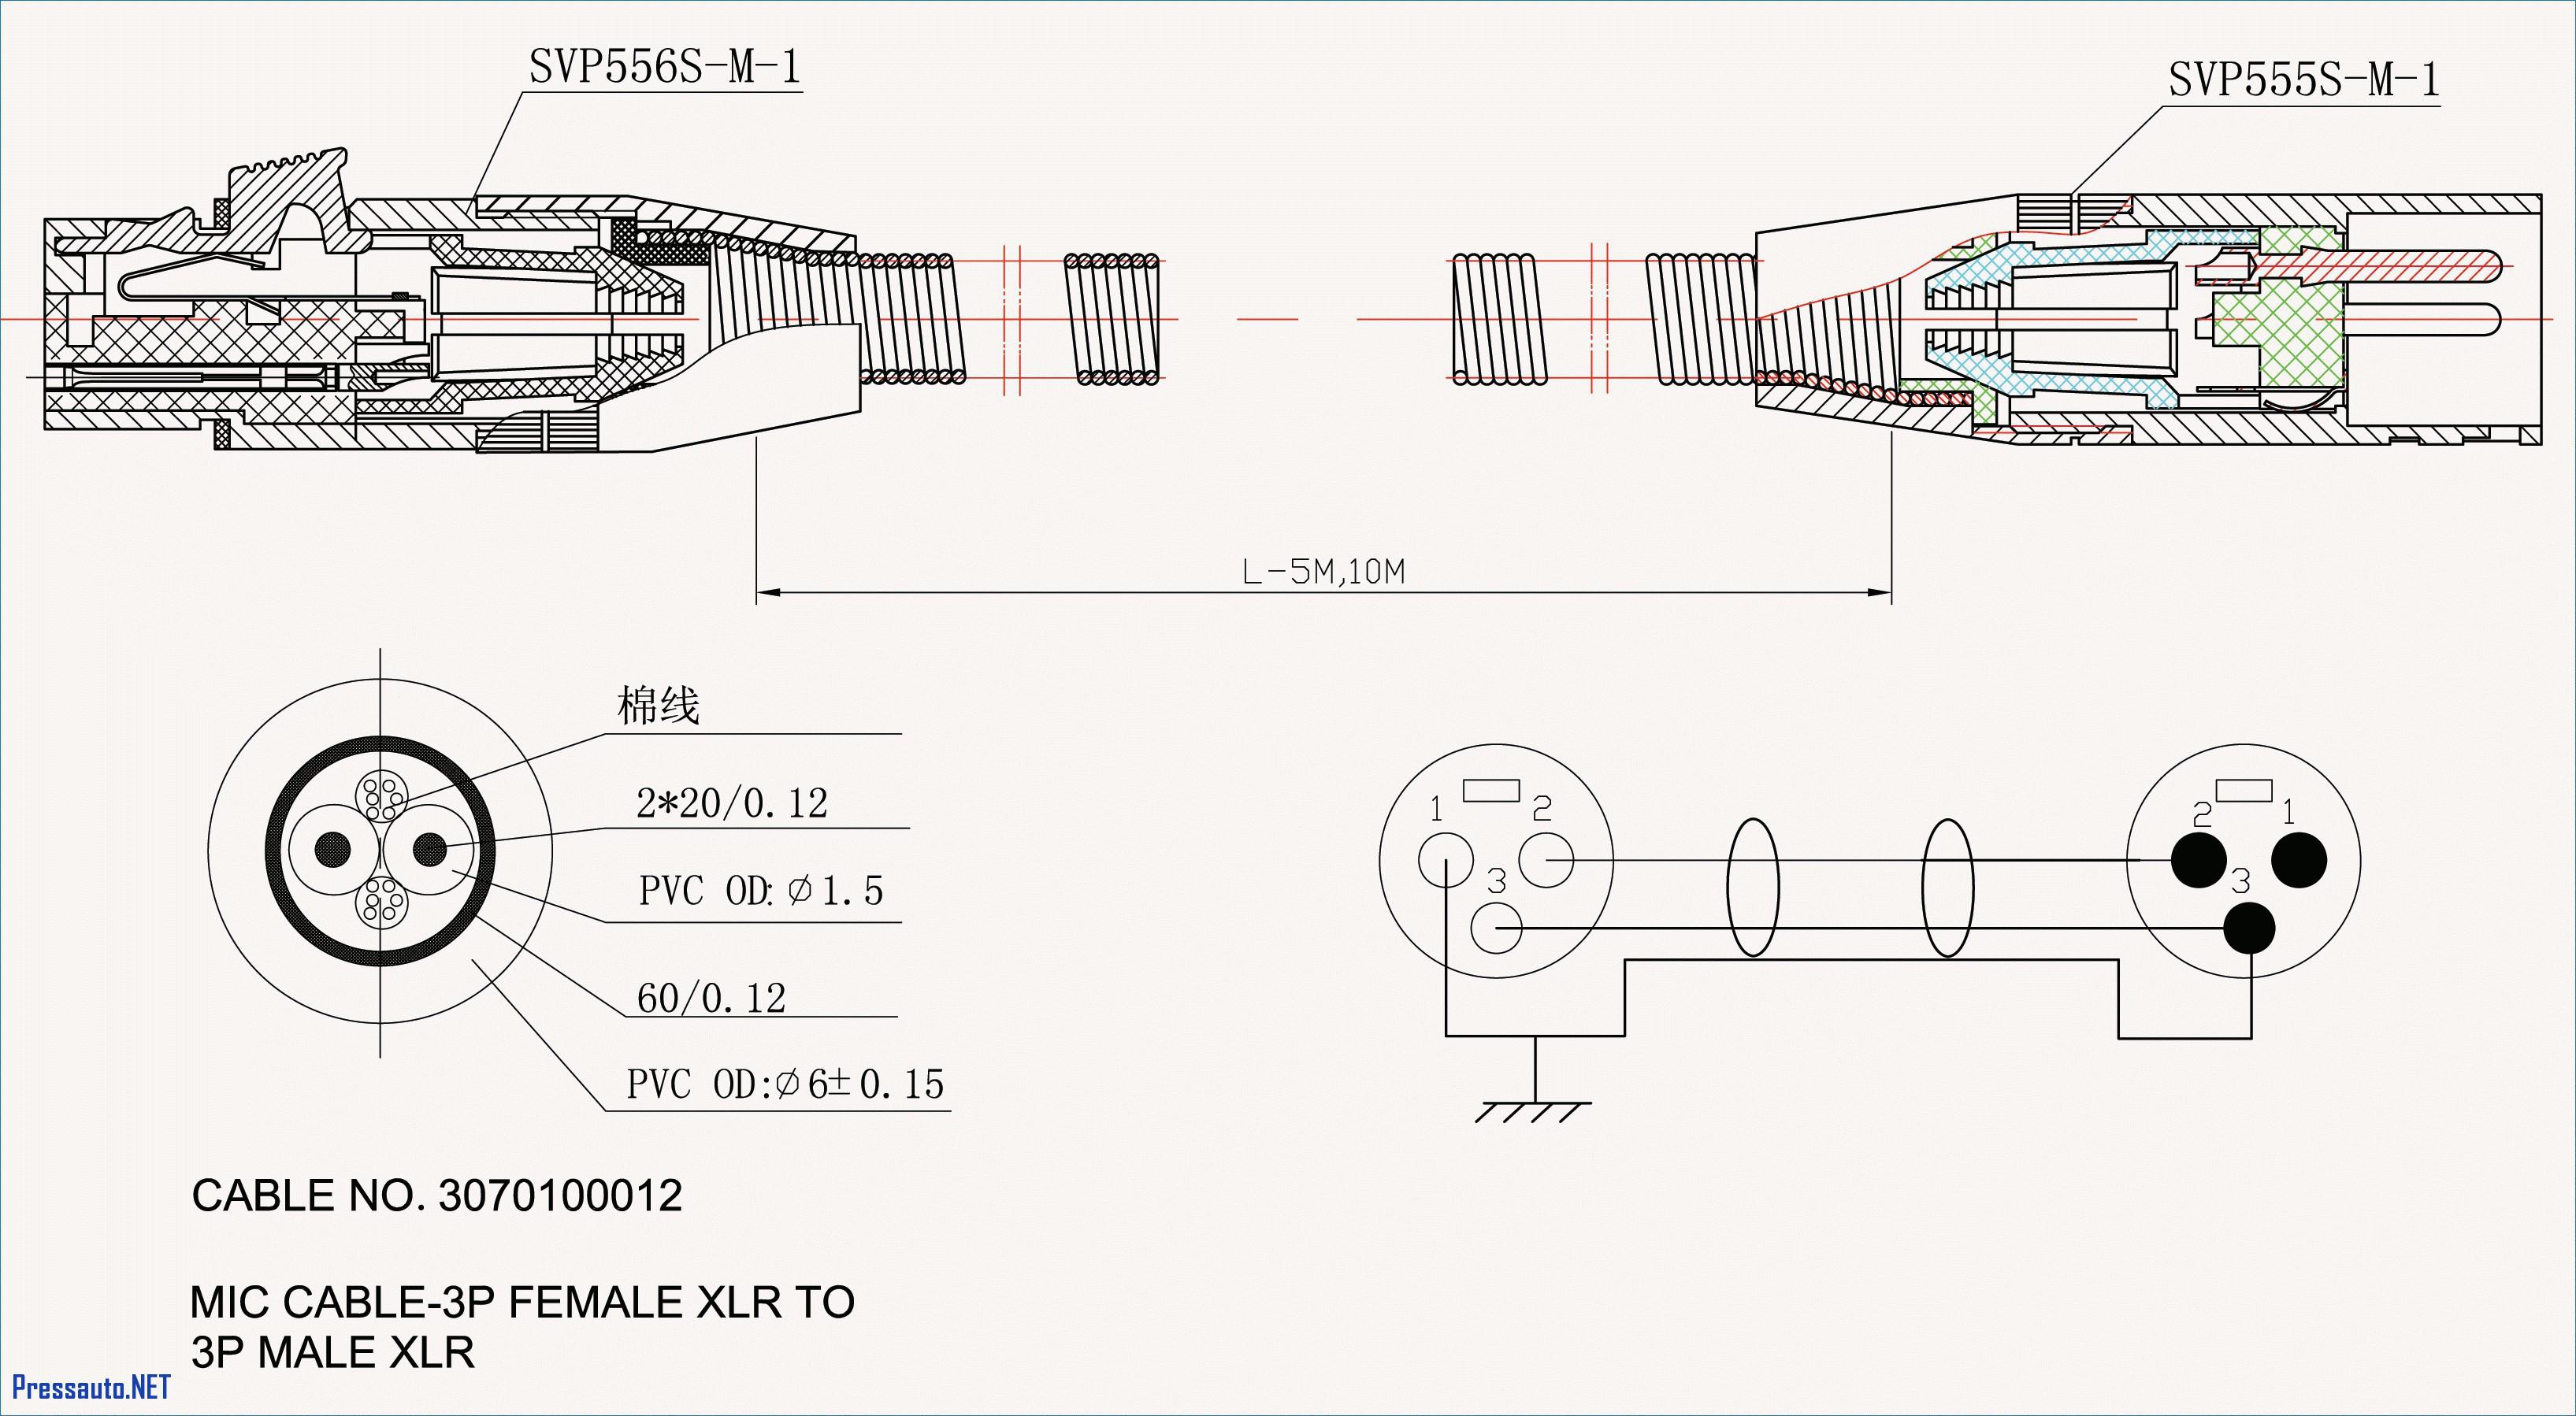 Lanair Waste Oil Heater Wiring Diagram Best Of 20 Amp Twist Lock - 20 Amp Twist Lock Plug Wiring Diagram